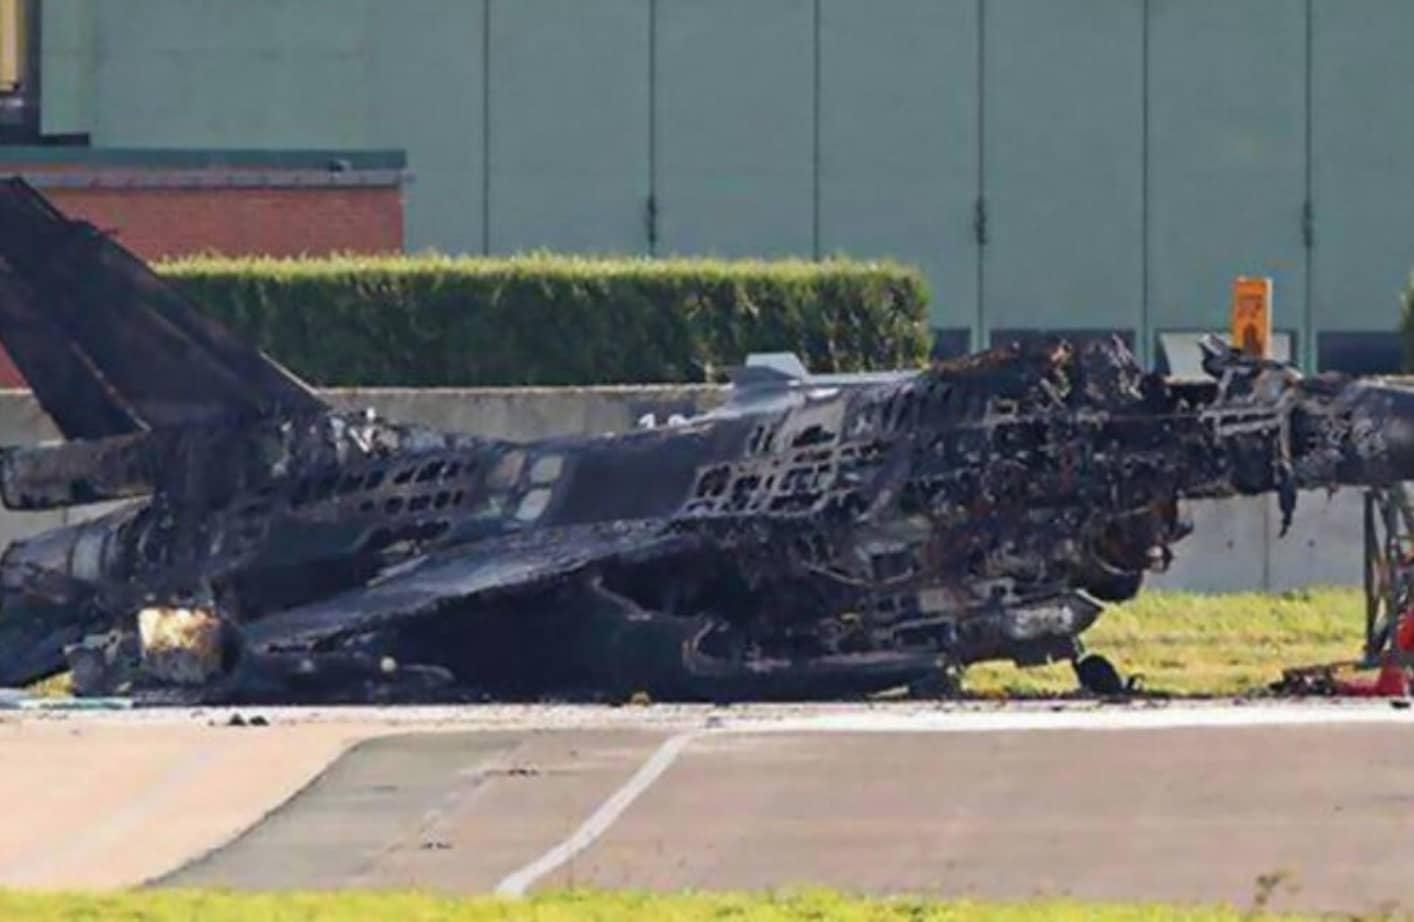 Yanlış Yere Park Edilmiş F 16 Jeti